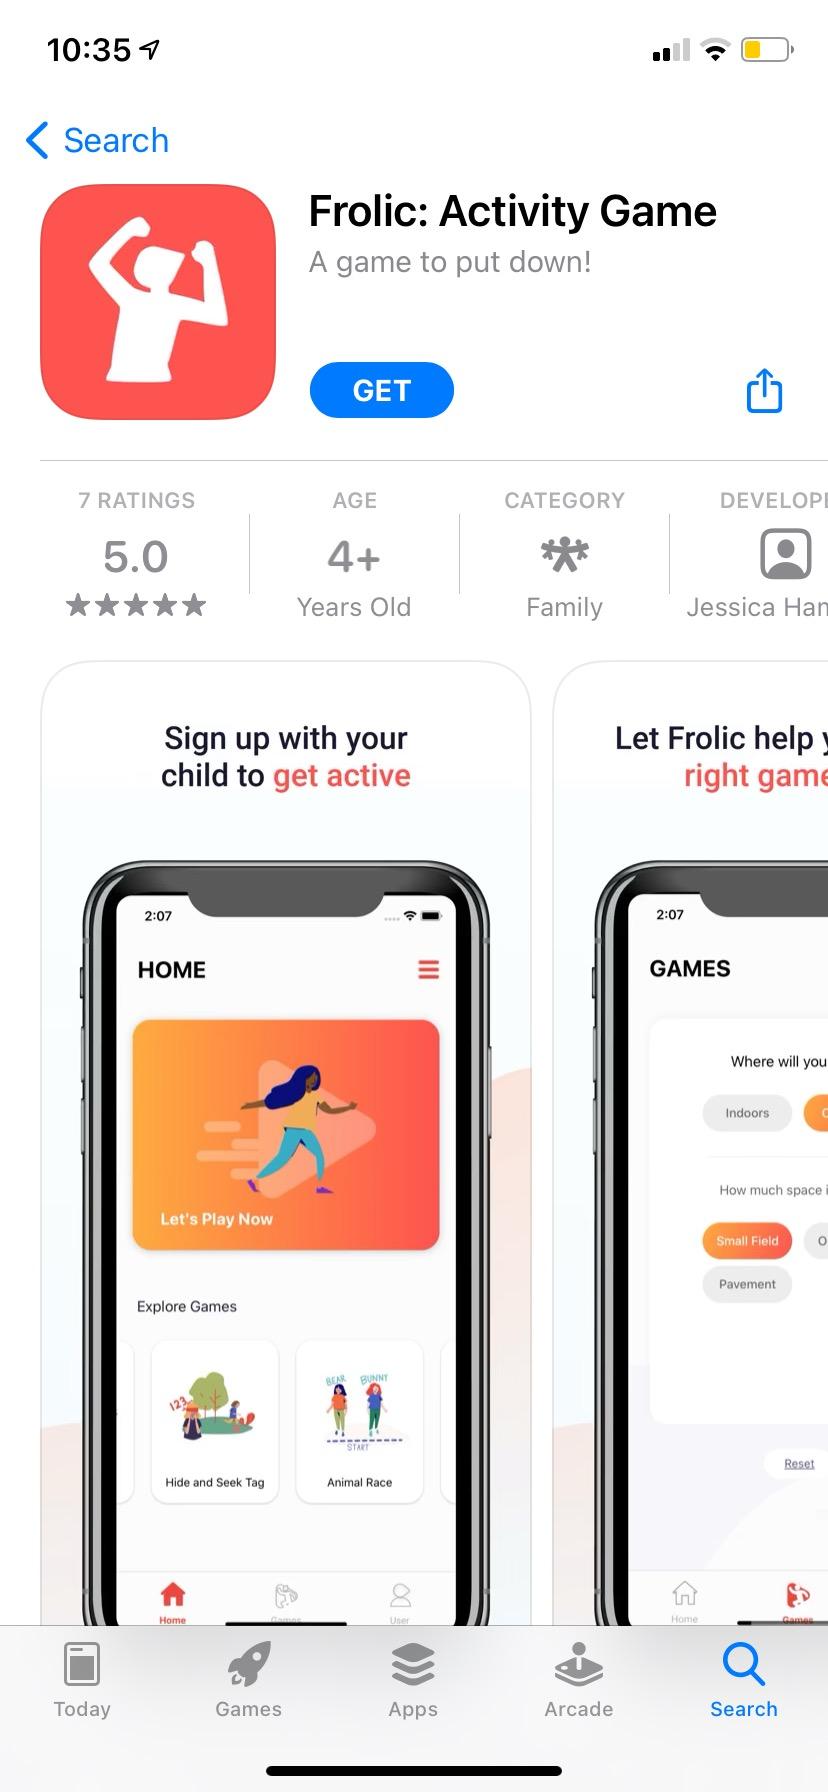 screenshot of the Frolic app in the App Store